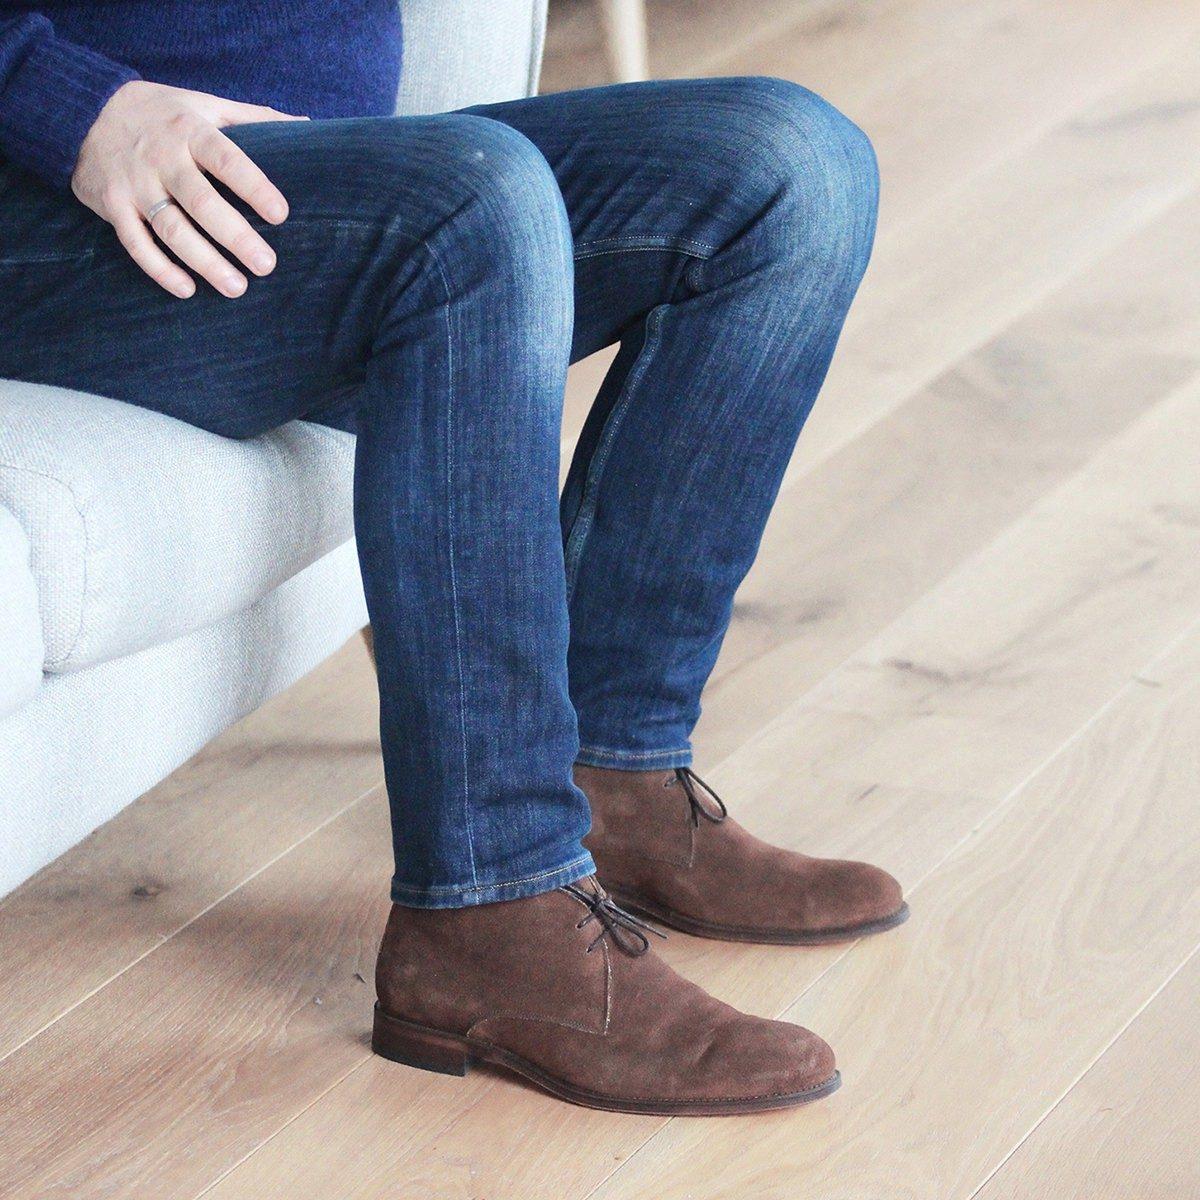 JULES & JENN - desert - boots - cuir - daim - marron